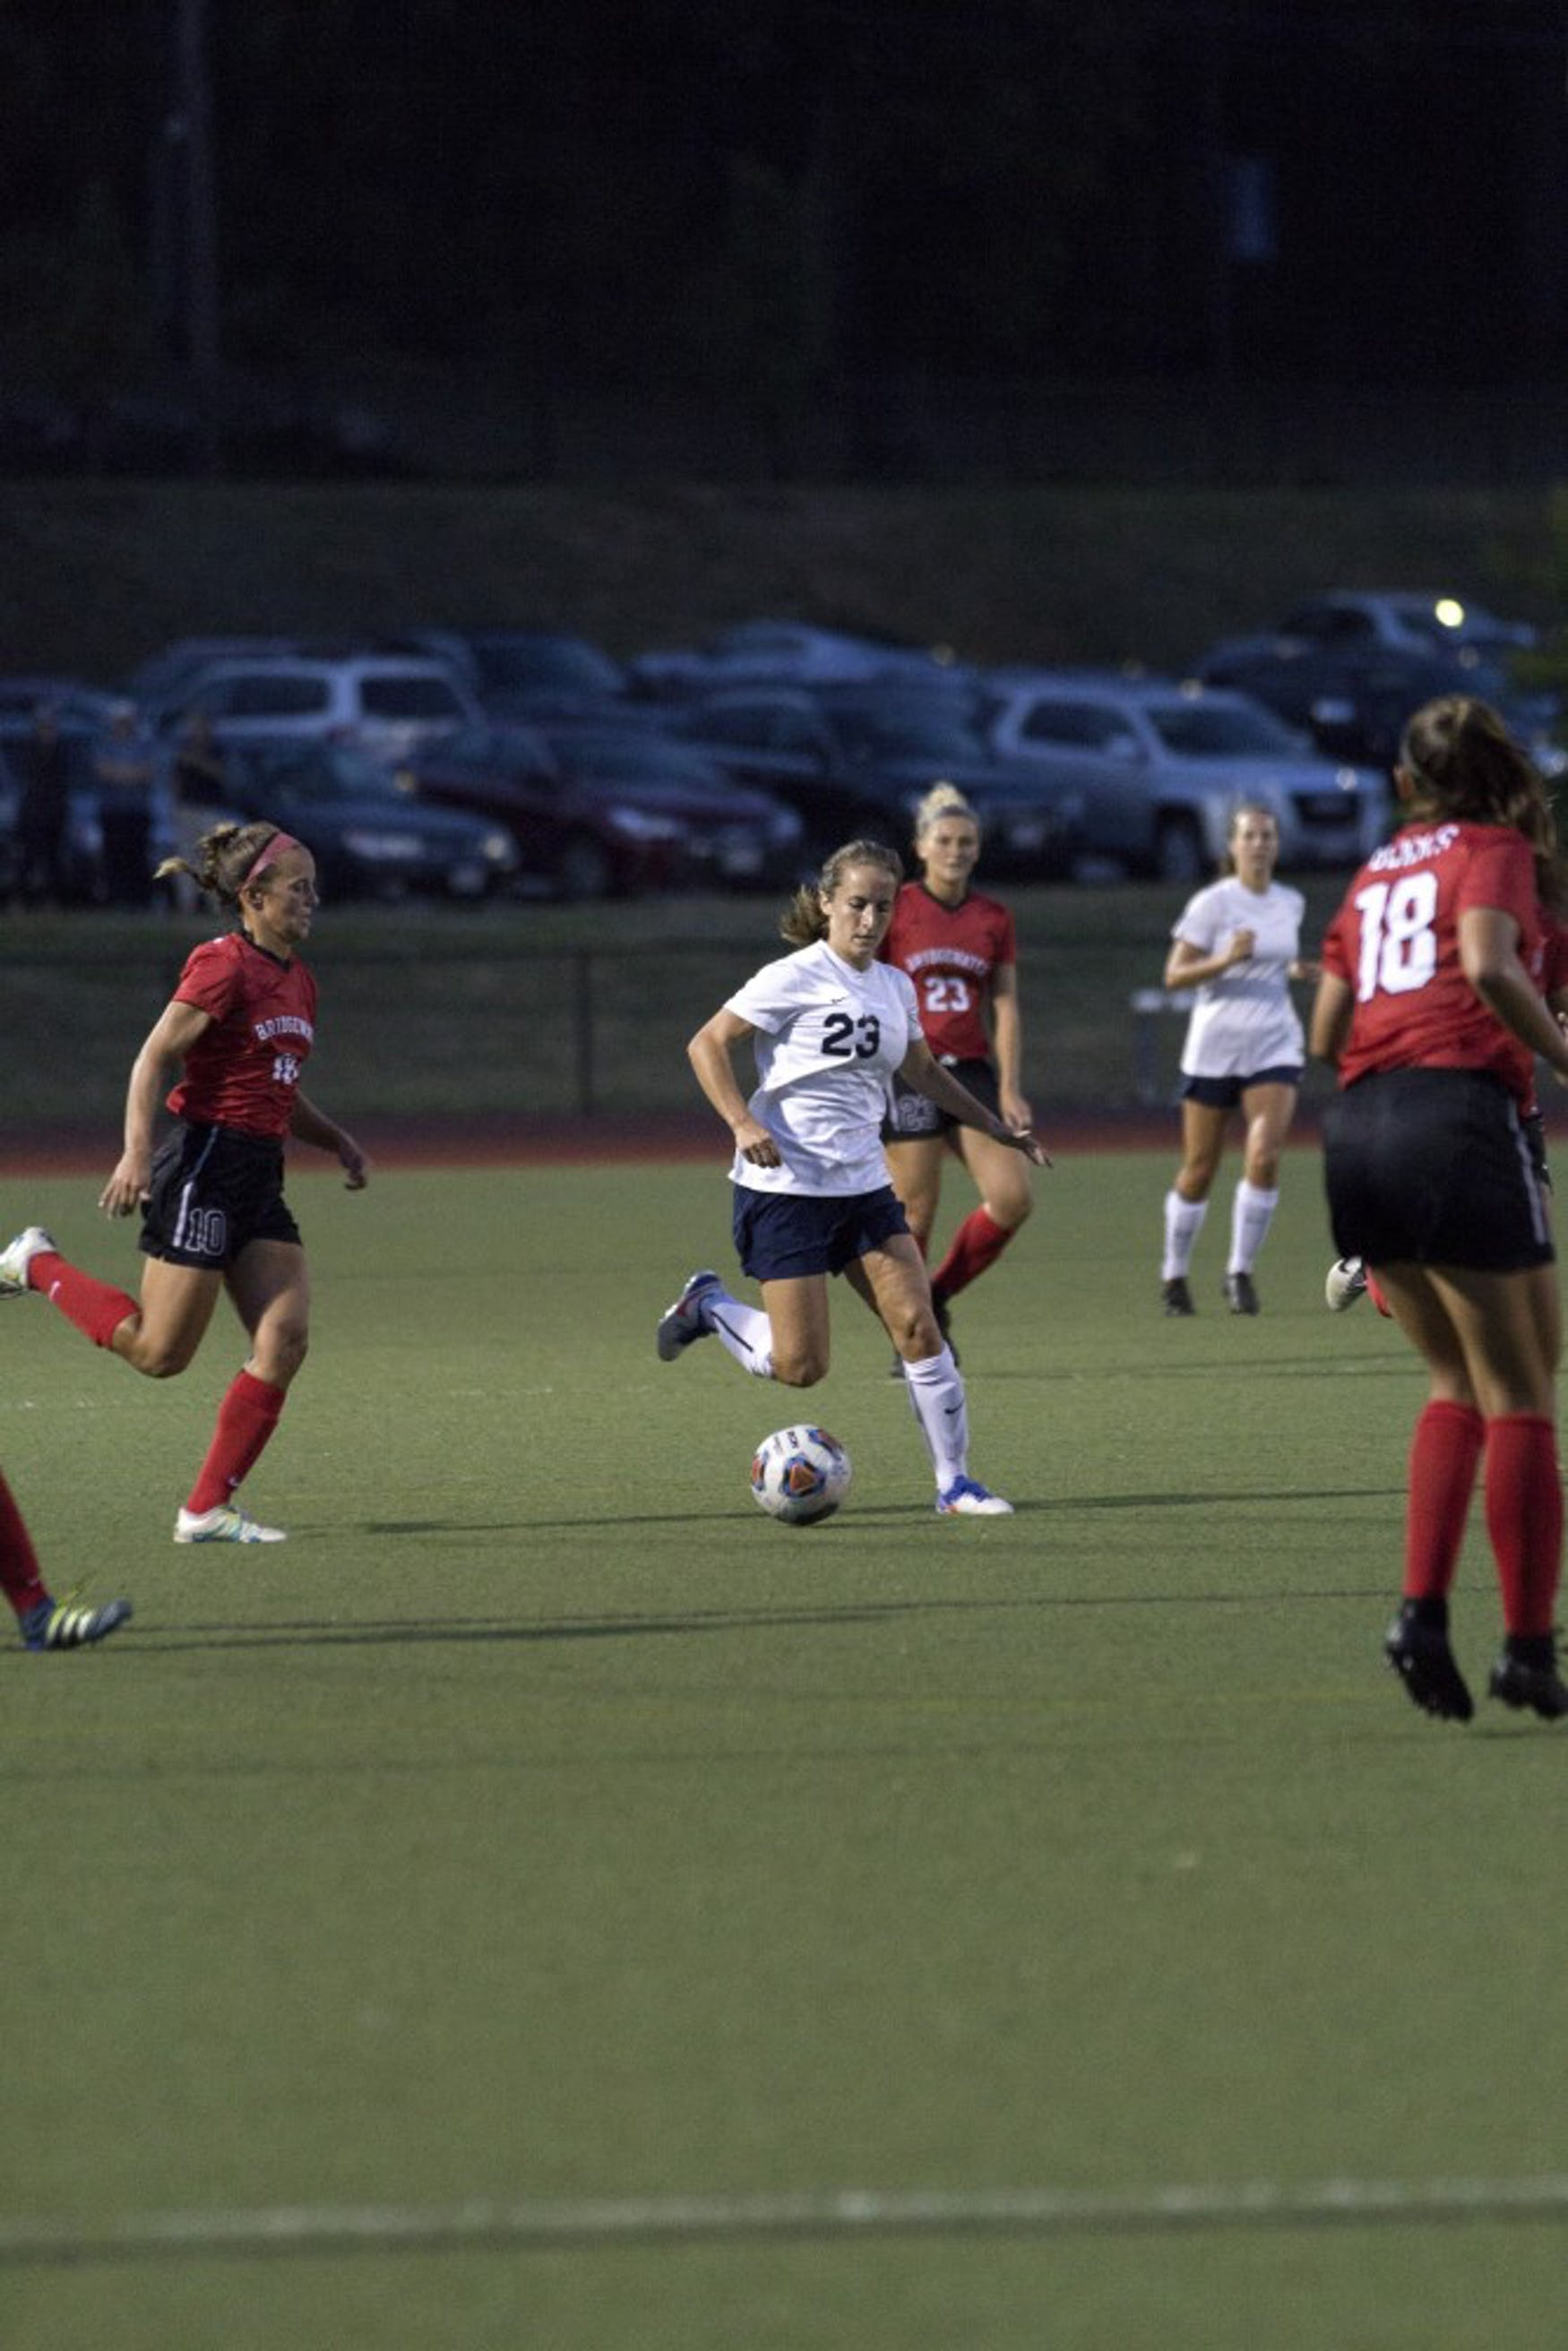 soccer-w-vs-bridgewater-9-5-17-nw-0348